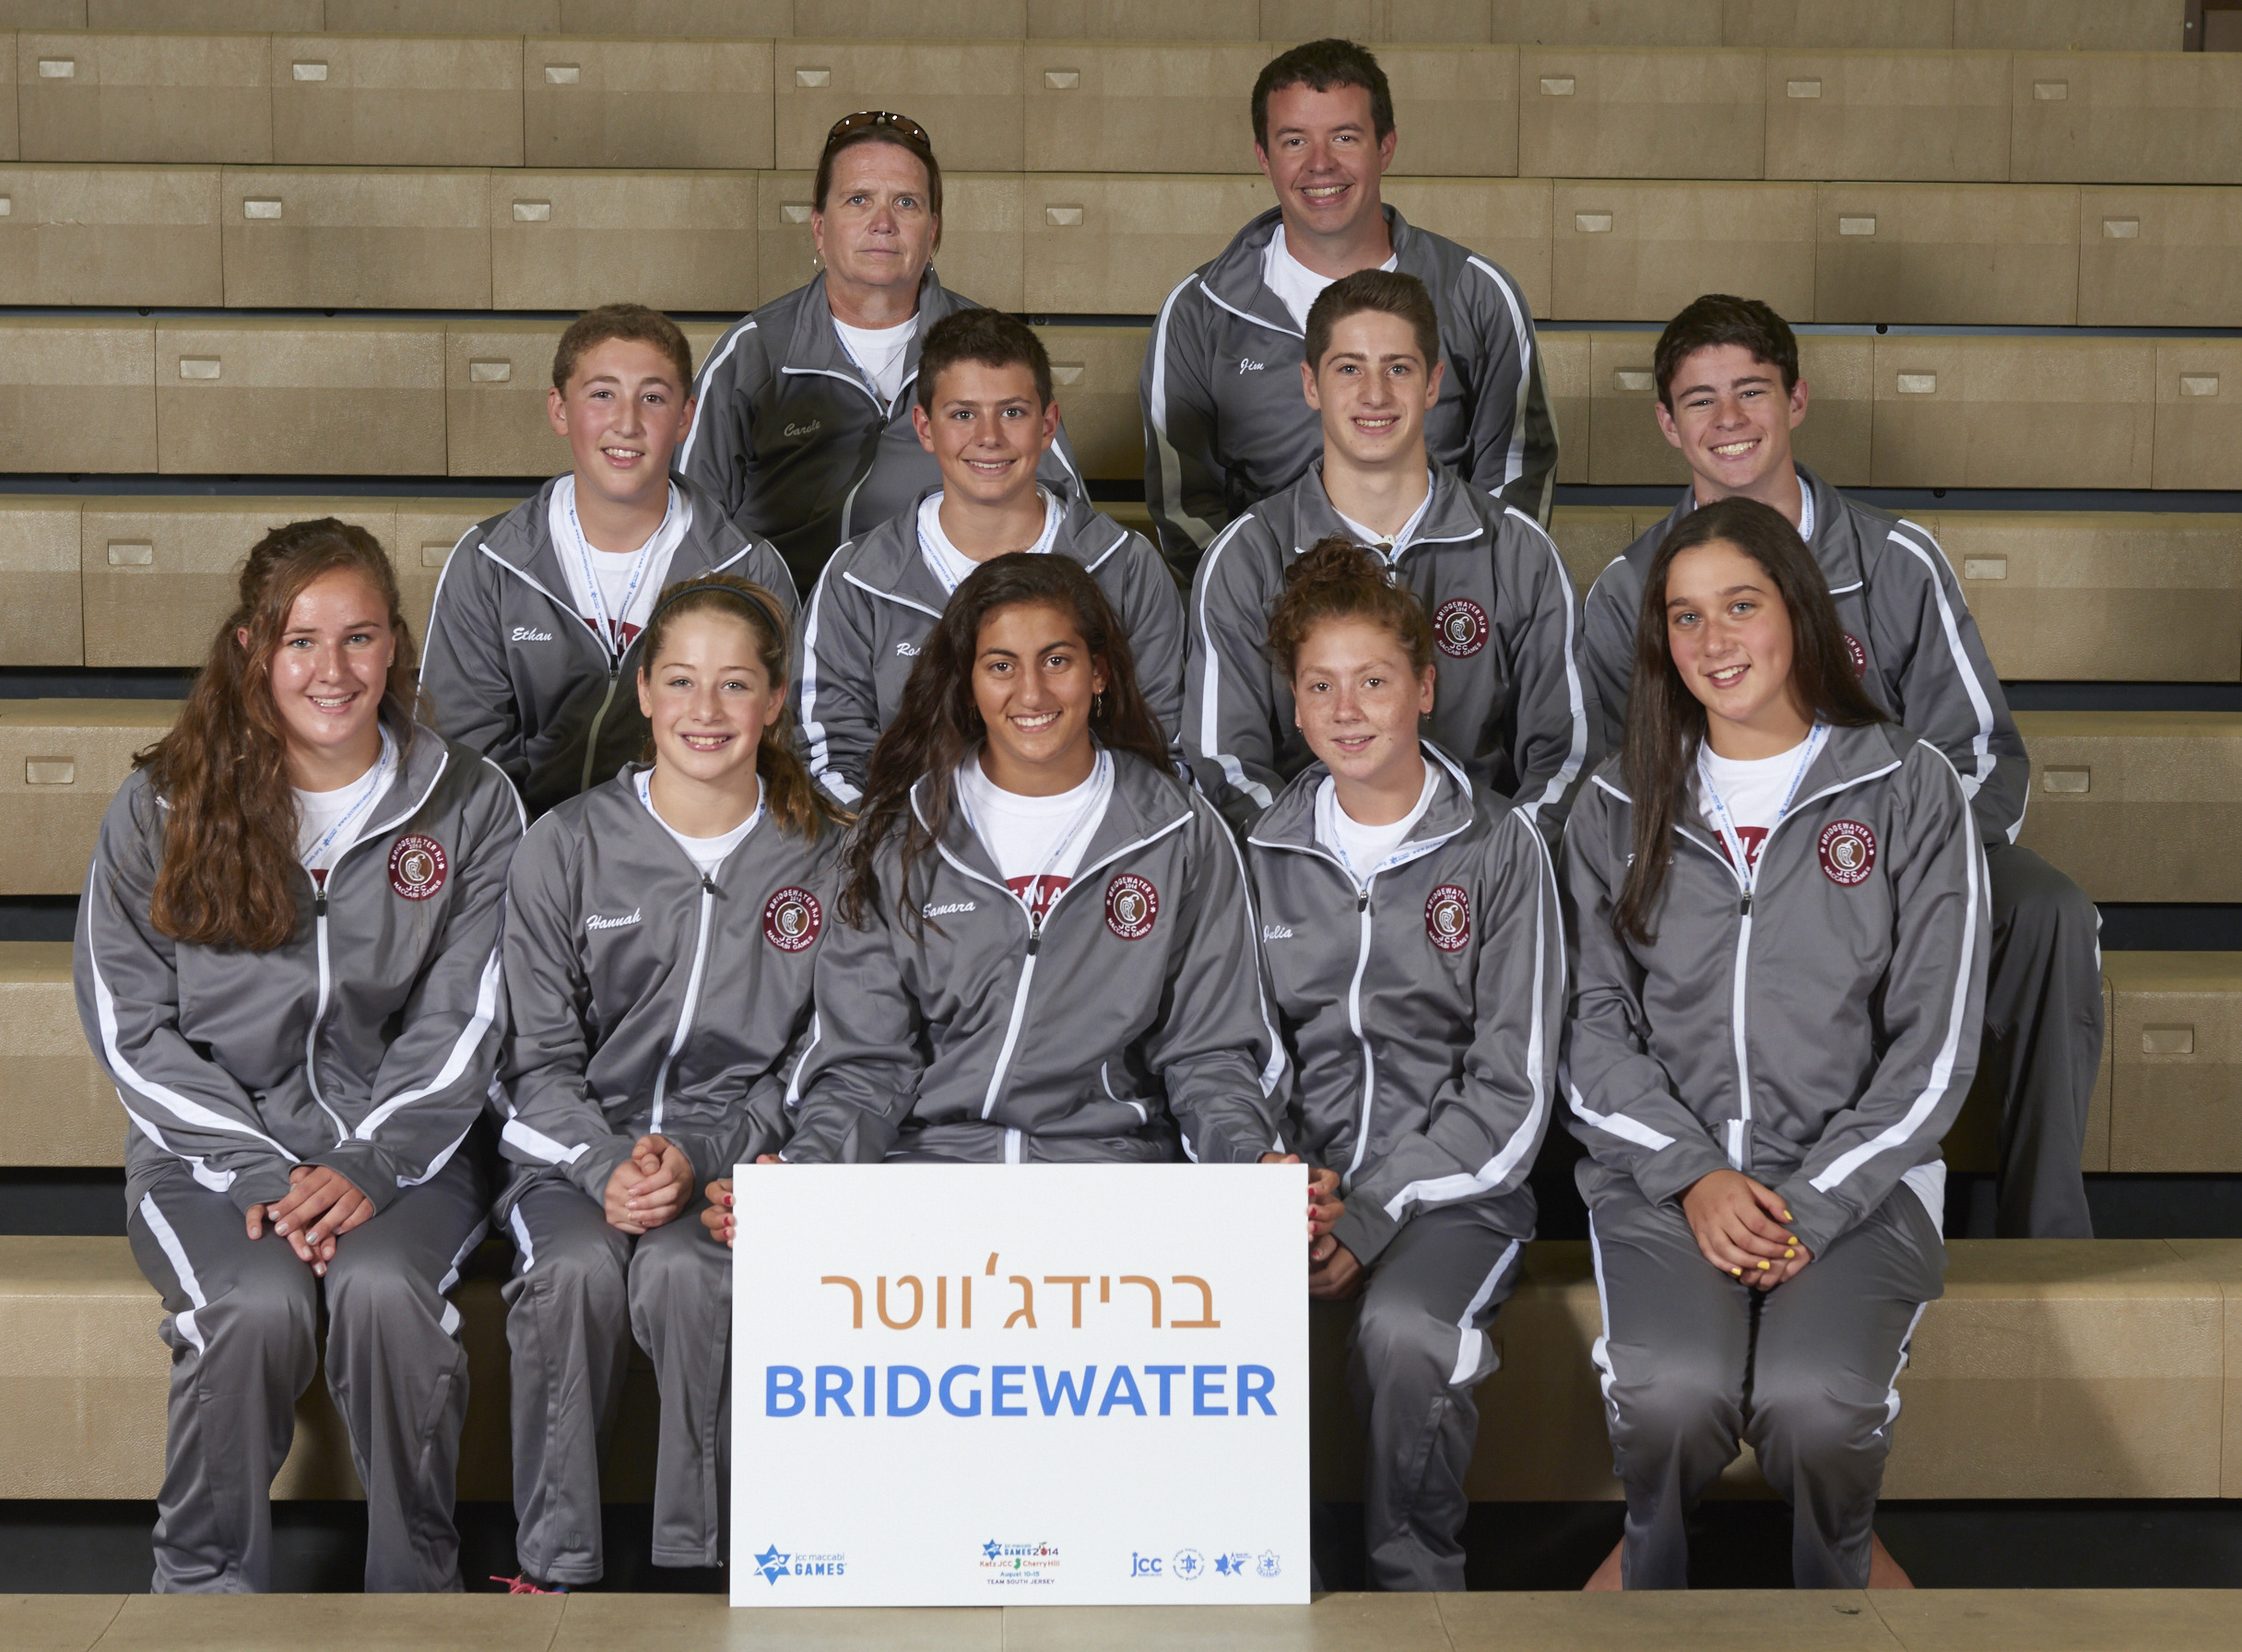 d9a2821edb07e66d4907_Maccabi_Games_2014_-_Delegation_photo_Cropped__8-10-14.jpg